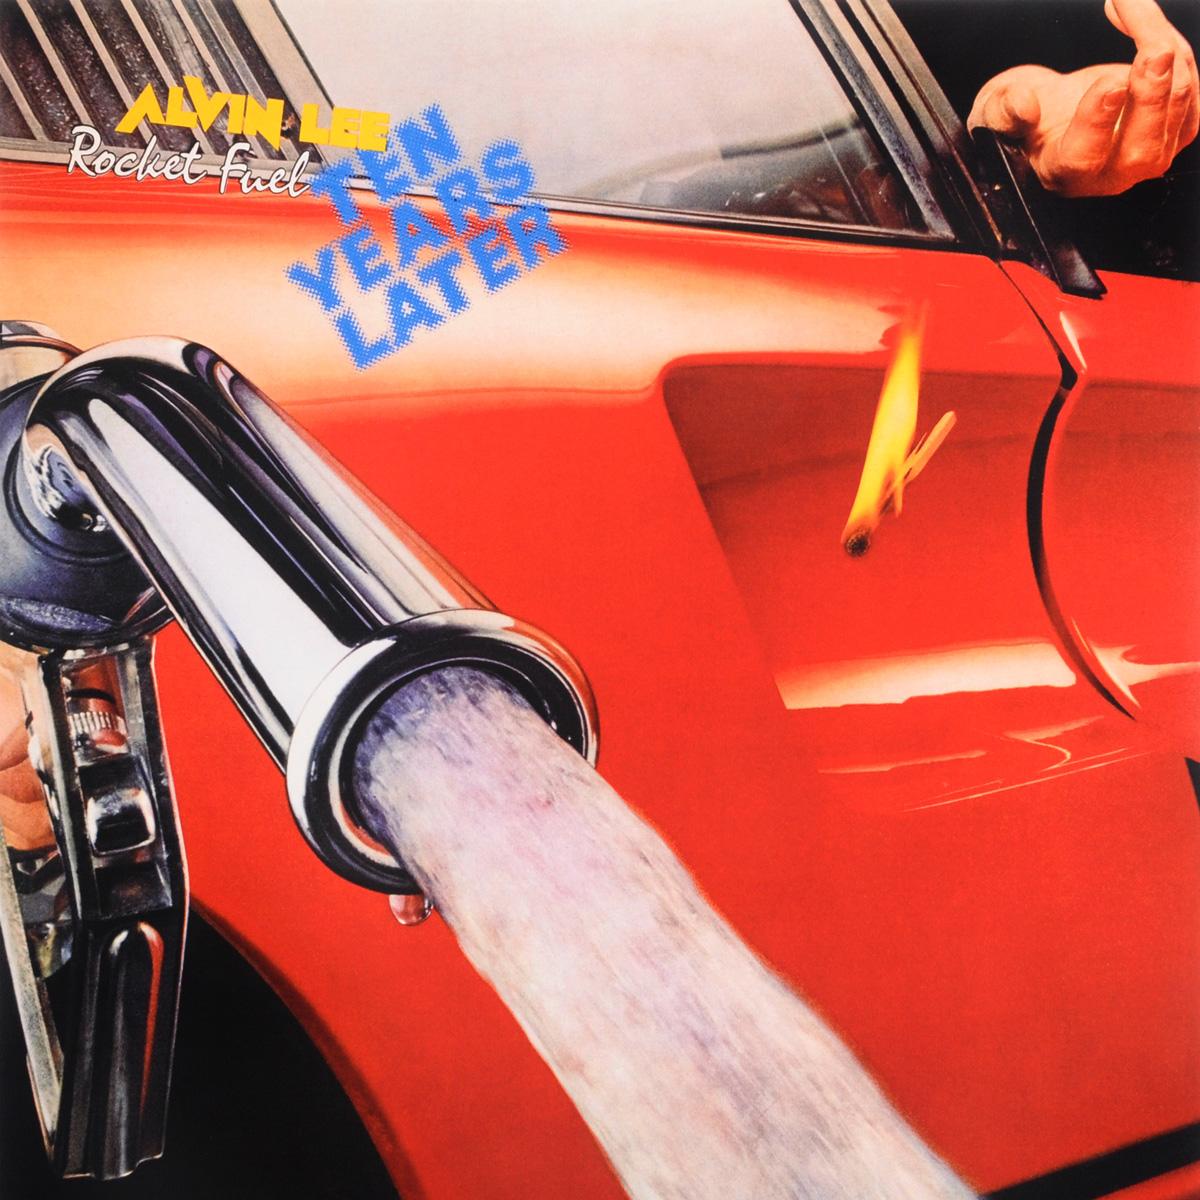 лучшая цена Алвин Ли,Ten Years Later Alvin Lee & Ten Years Later. Rocket Fuel (LP)